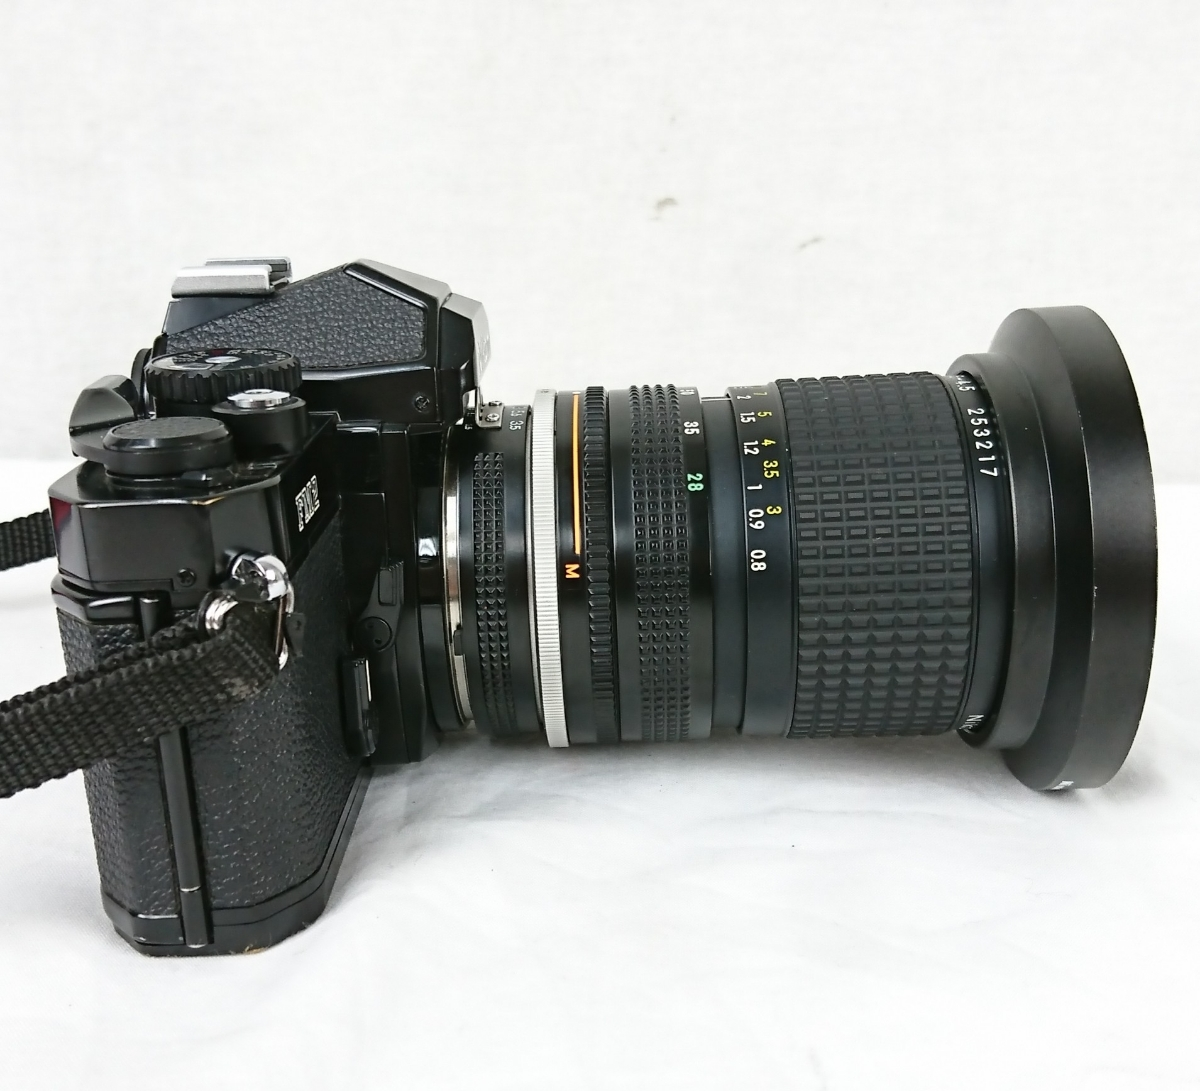 【GK-201】 Nikon ニコン カメラ FM2 レンズ Zoom-NIKKOR 28~85mm 1:3.5~4.5 黒色 black ブラックボディー N7763716 MFカメラ _画像4